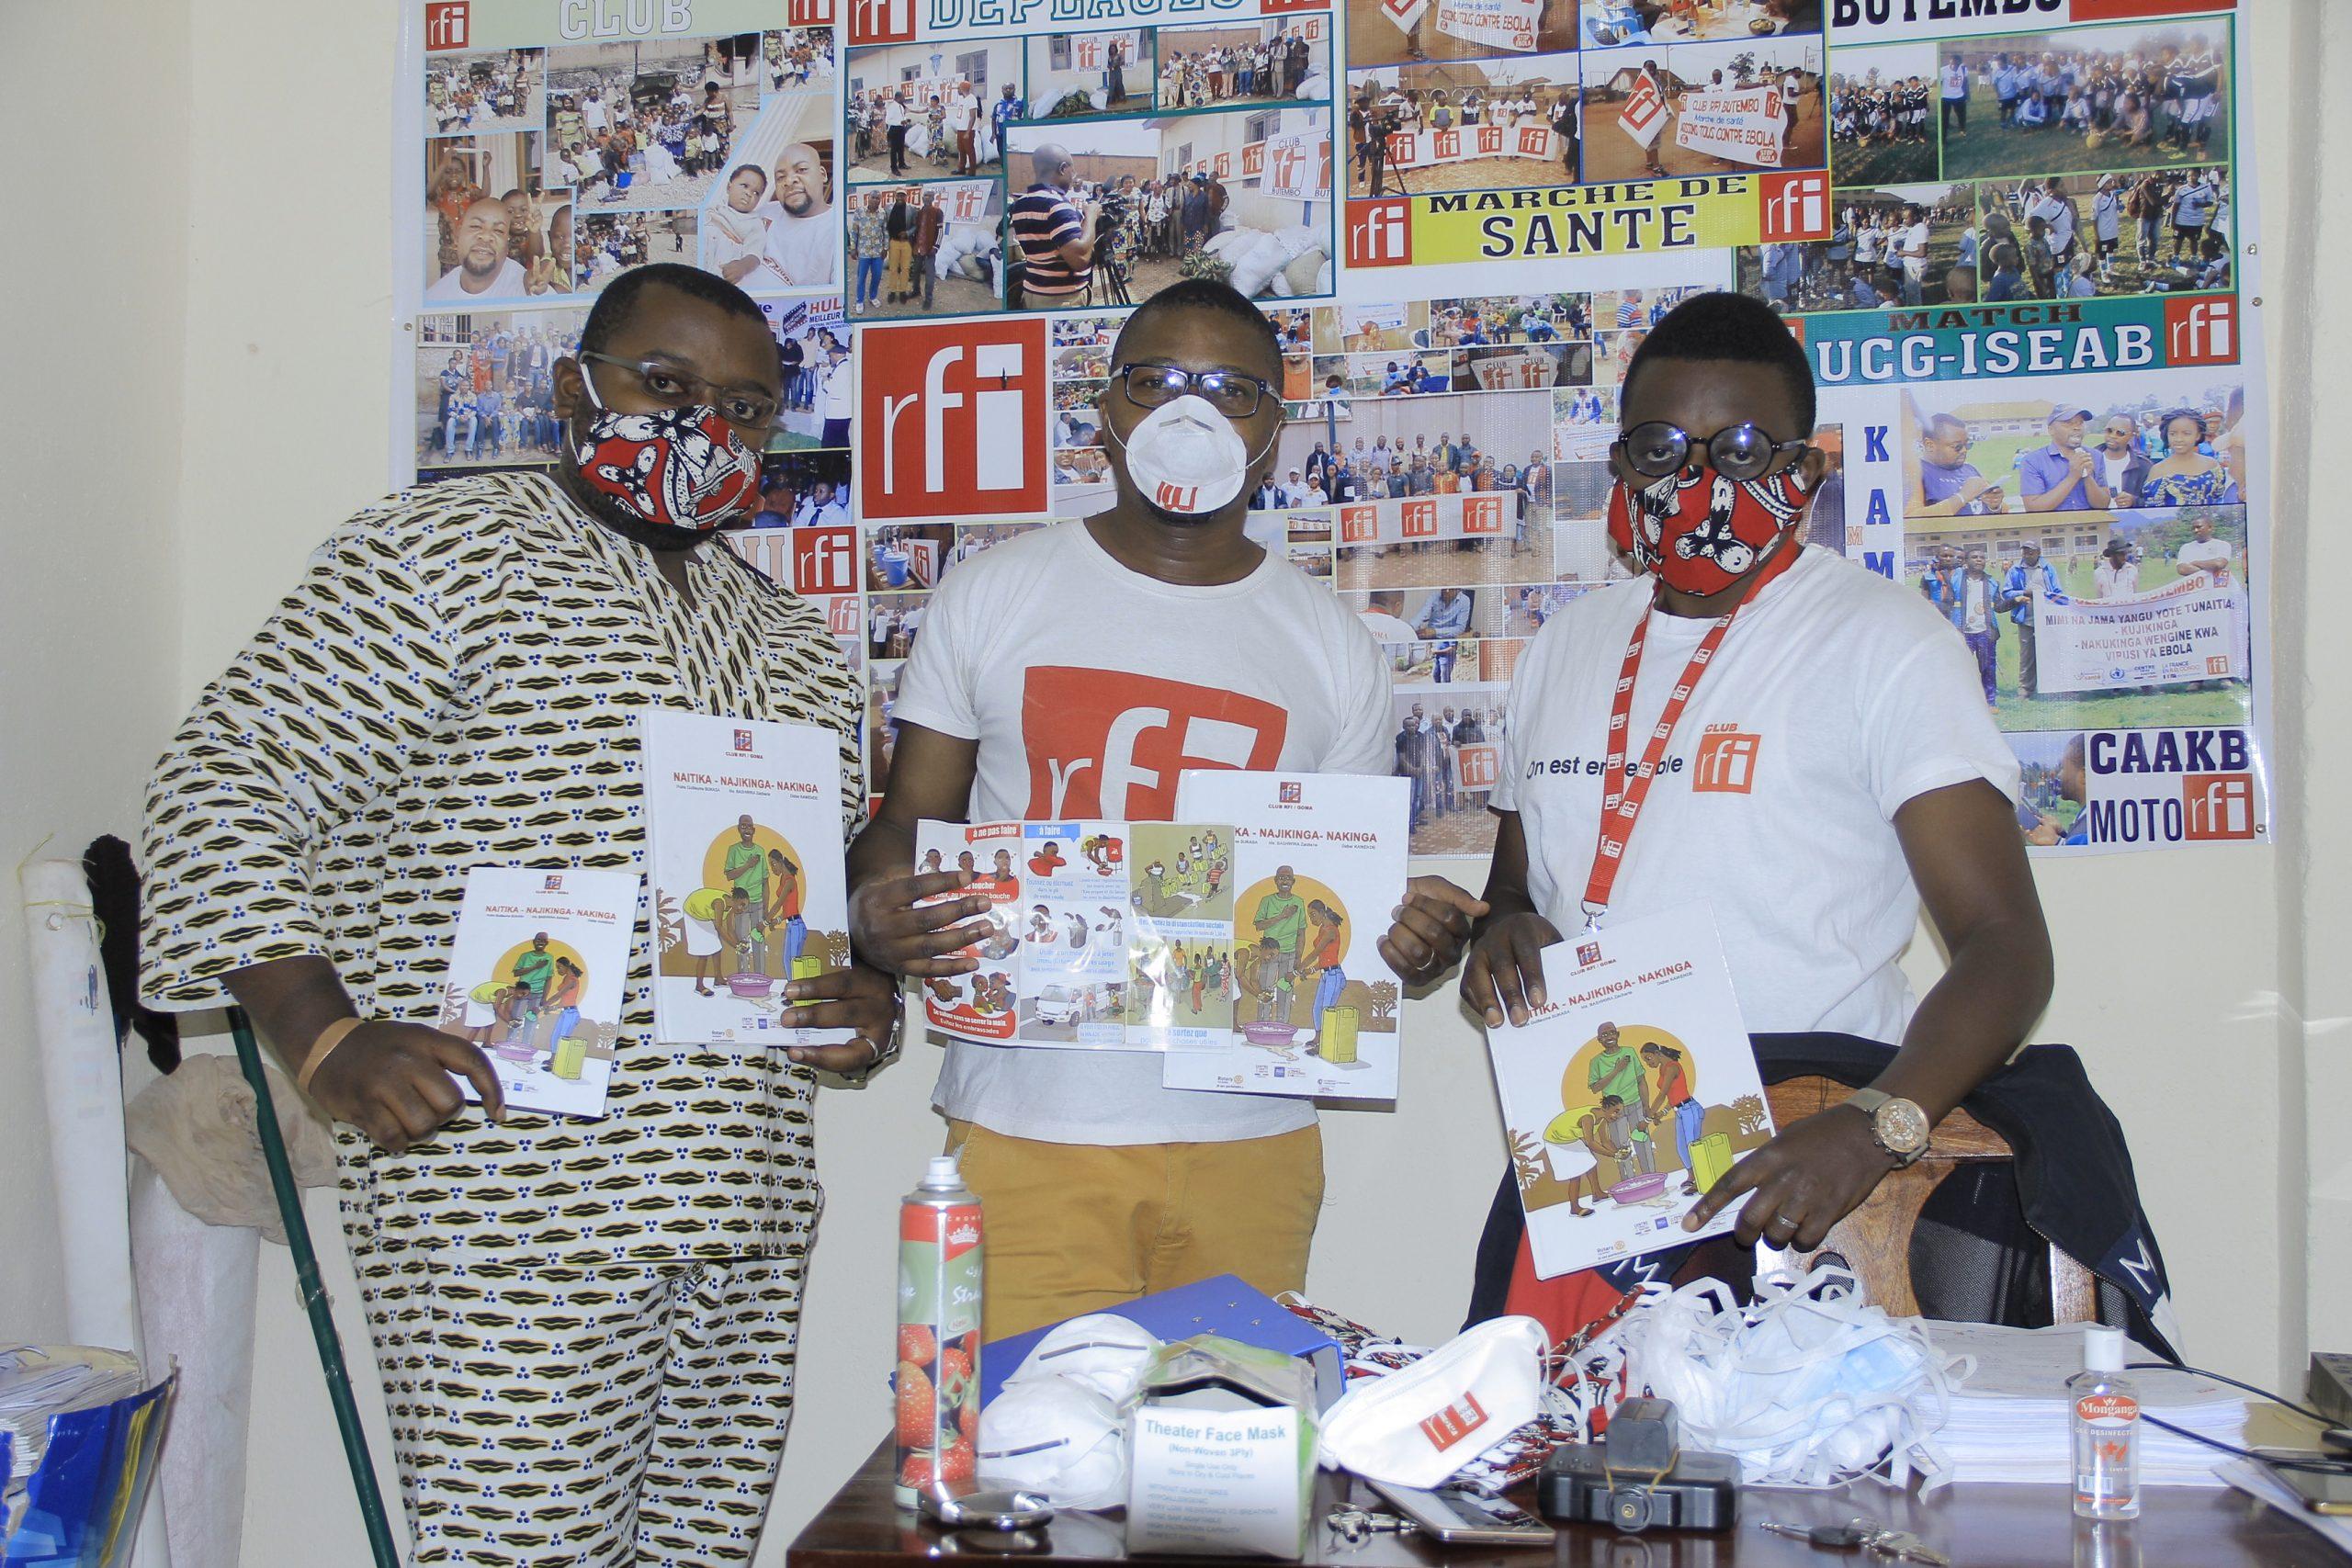 Butembo : Le Club RFI a désormais son propre bureau